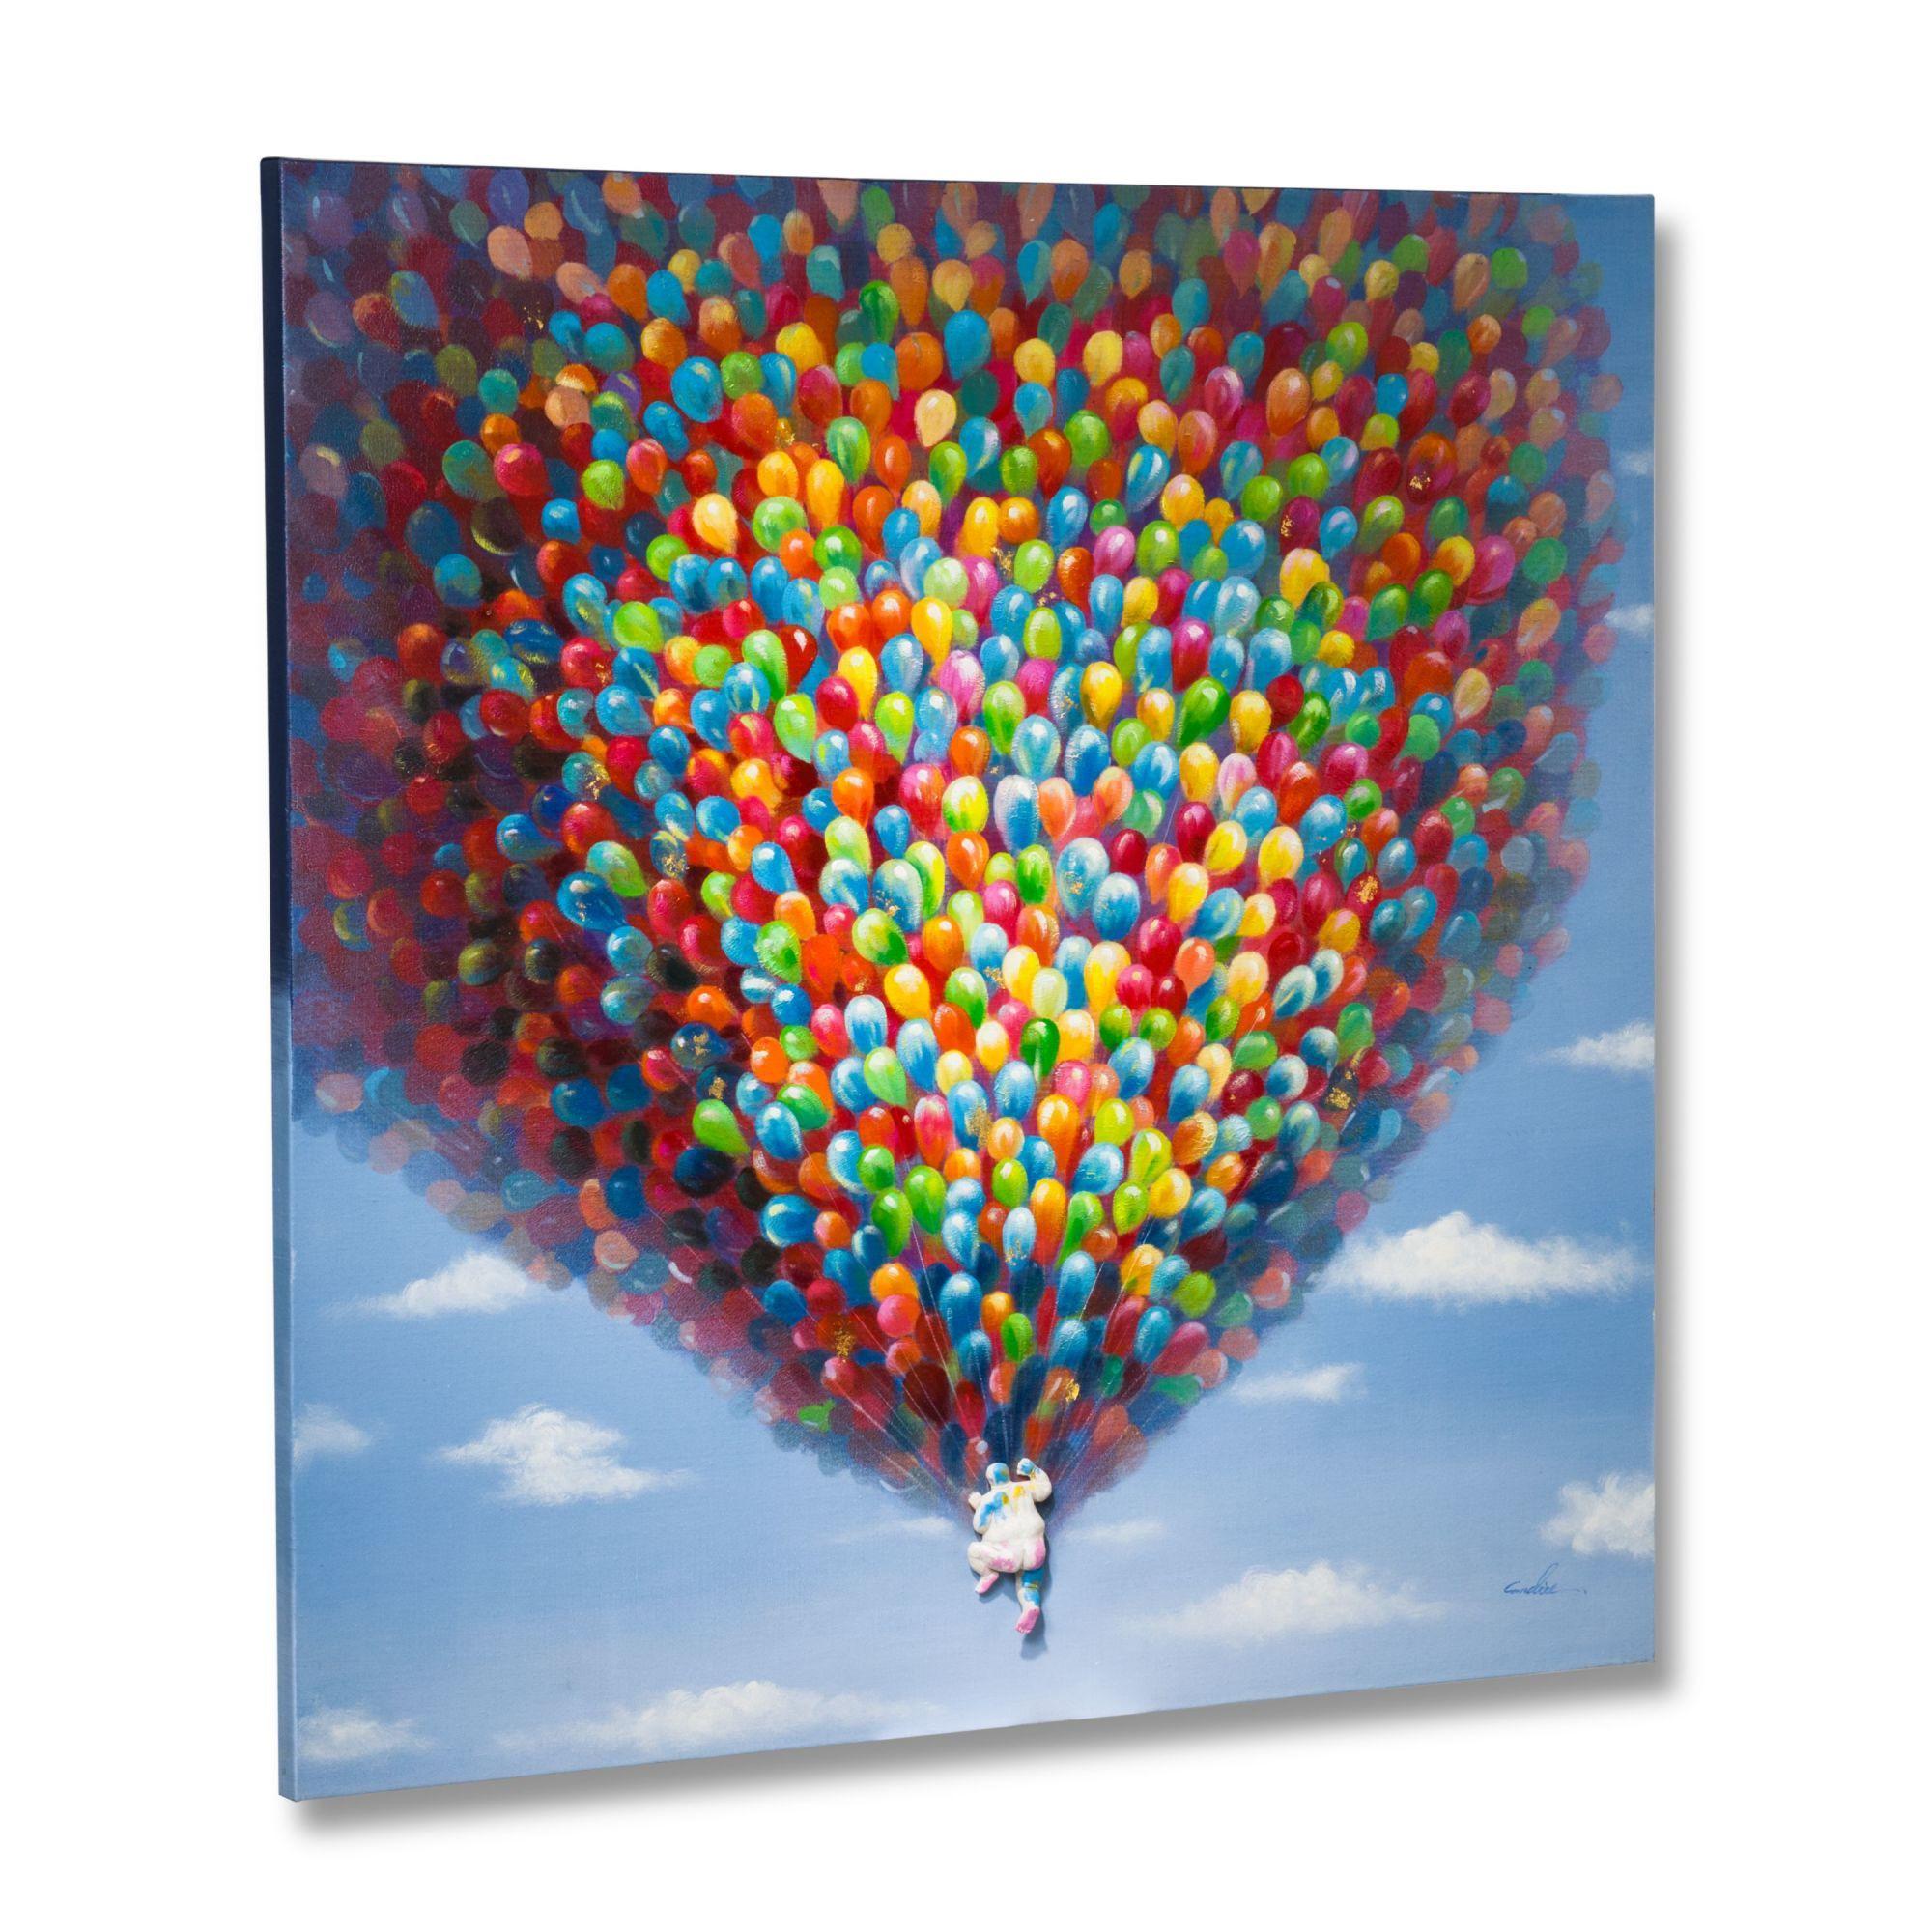 Bild Balloons, Color Blocking, Leinwand, Acryl - Bilder - Dekoration